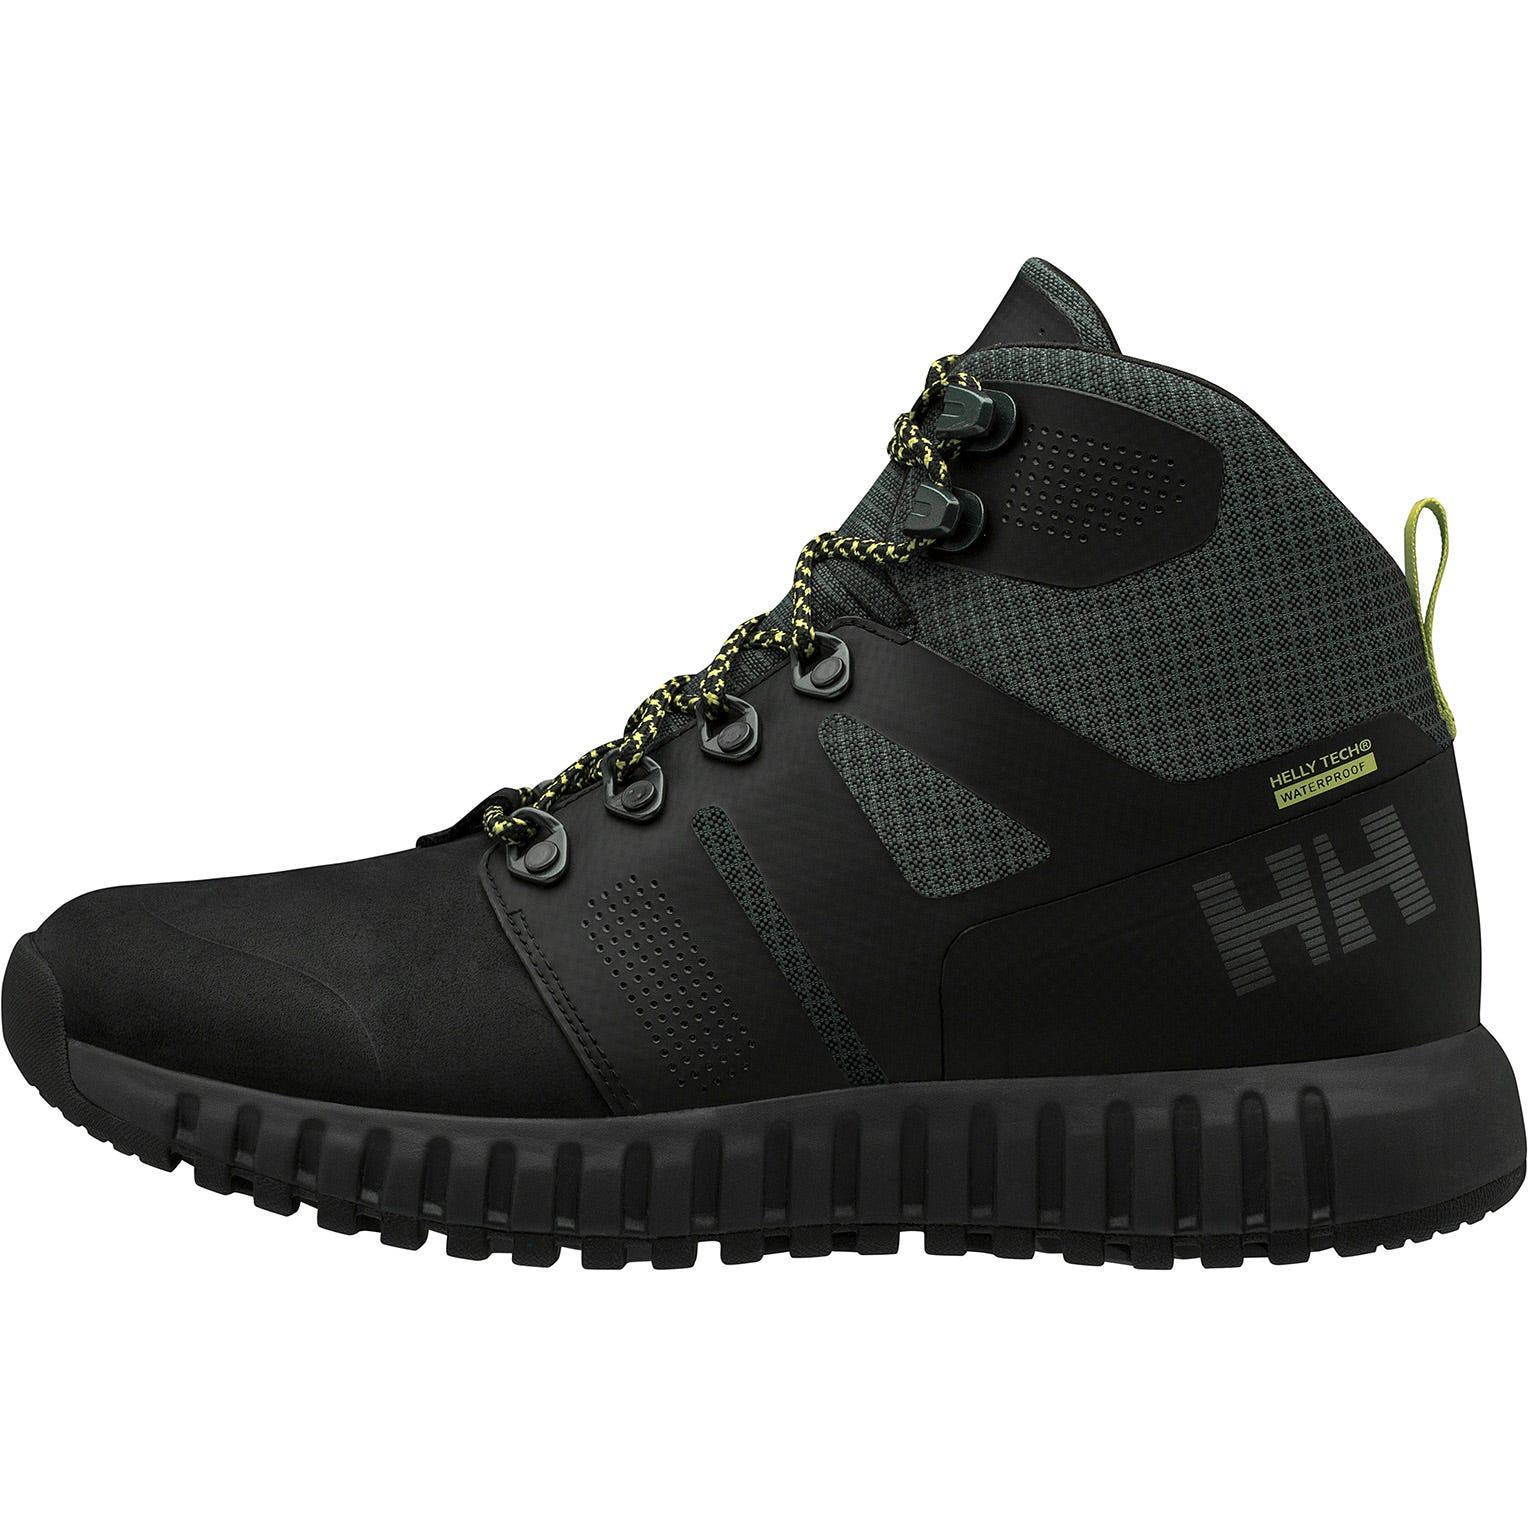 Helly Hansen Vanir Gallivant Ht Mens Hiking Boot Black 46/11.5